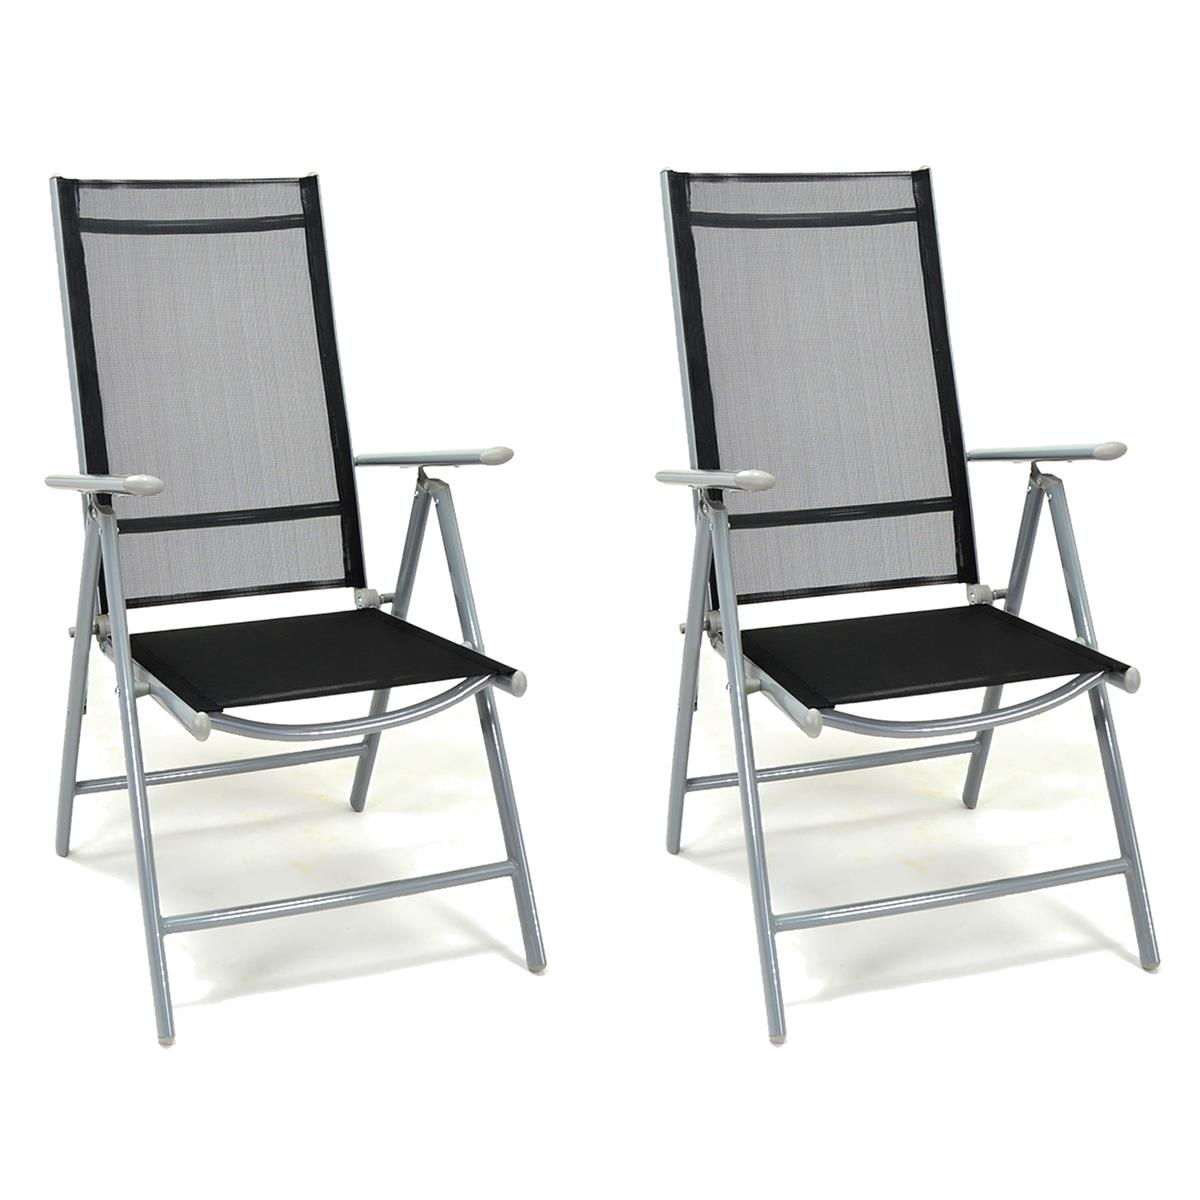 2er Set Klappstuhl schwarz Aluminium Gartenstuhl Balkonstuhl Rahmen silber